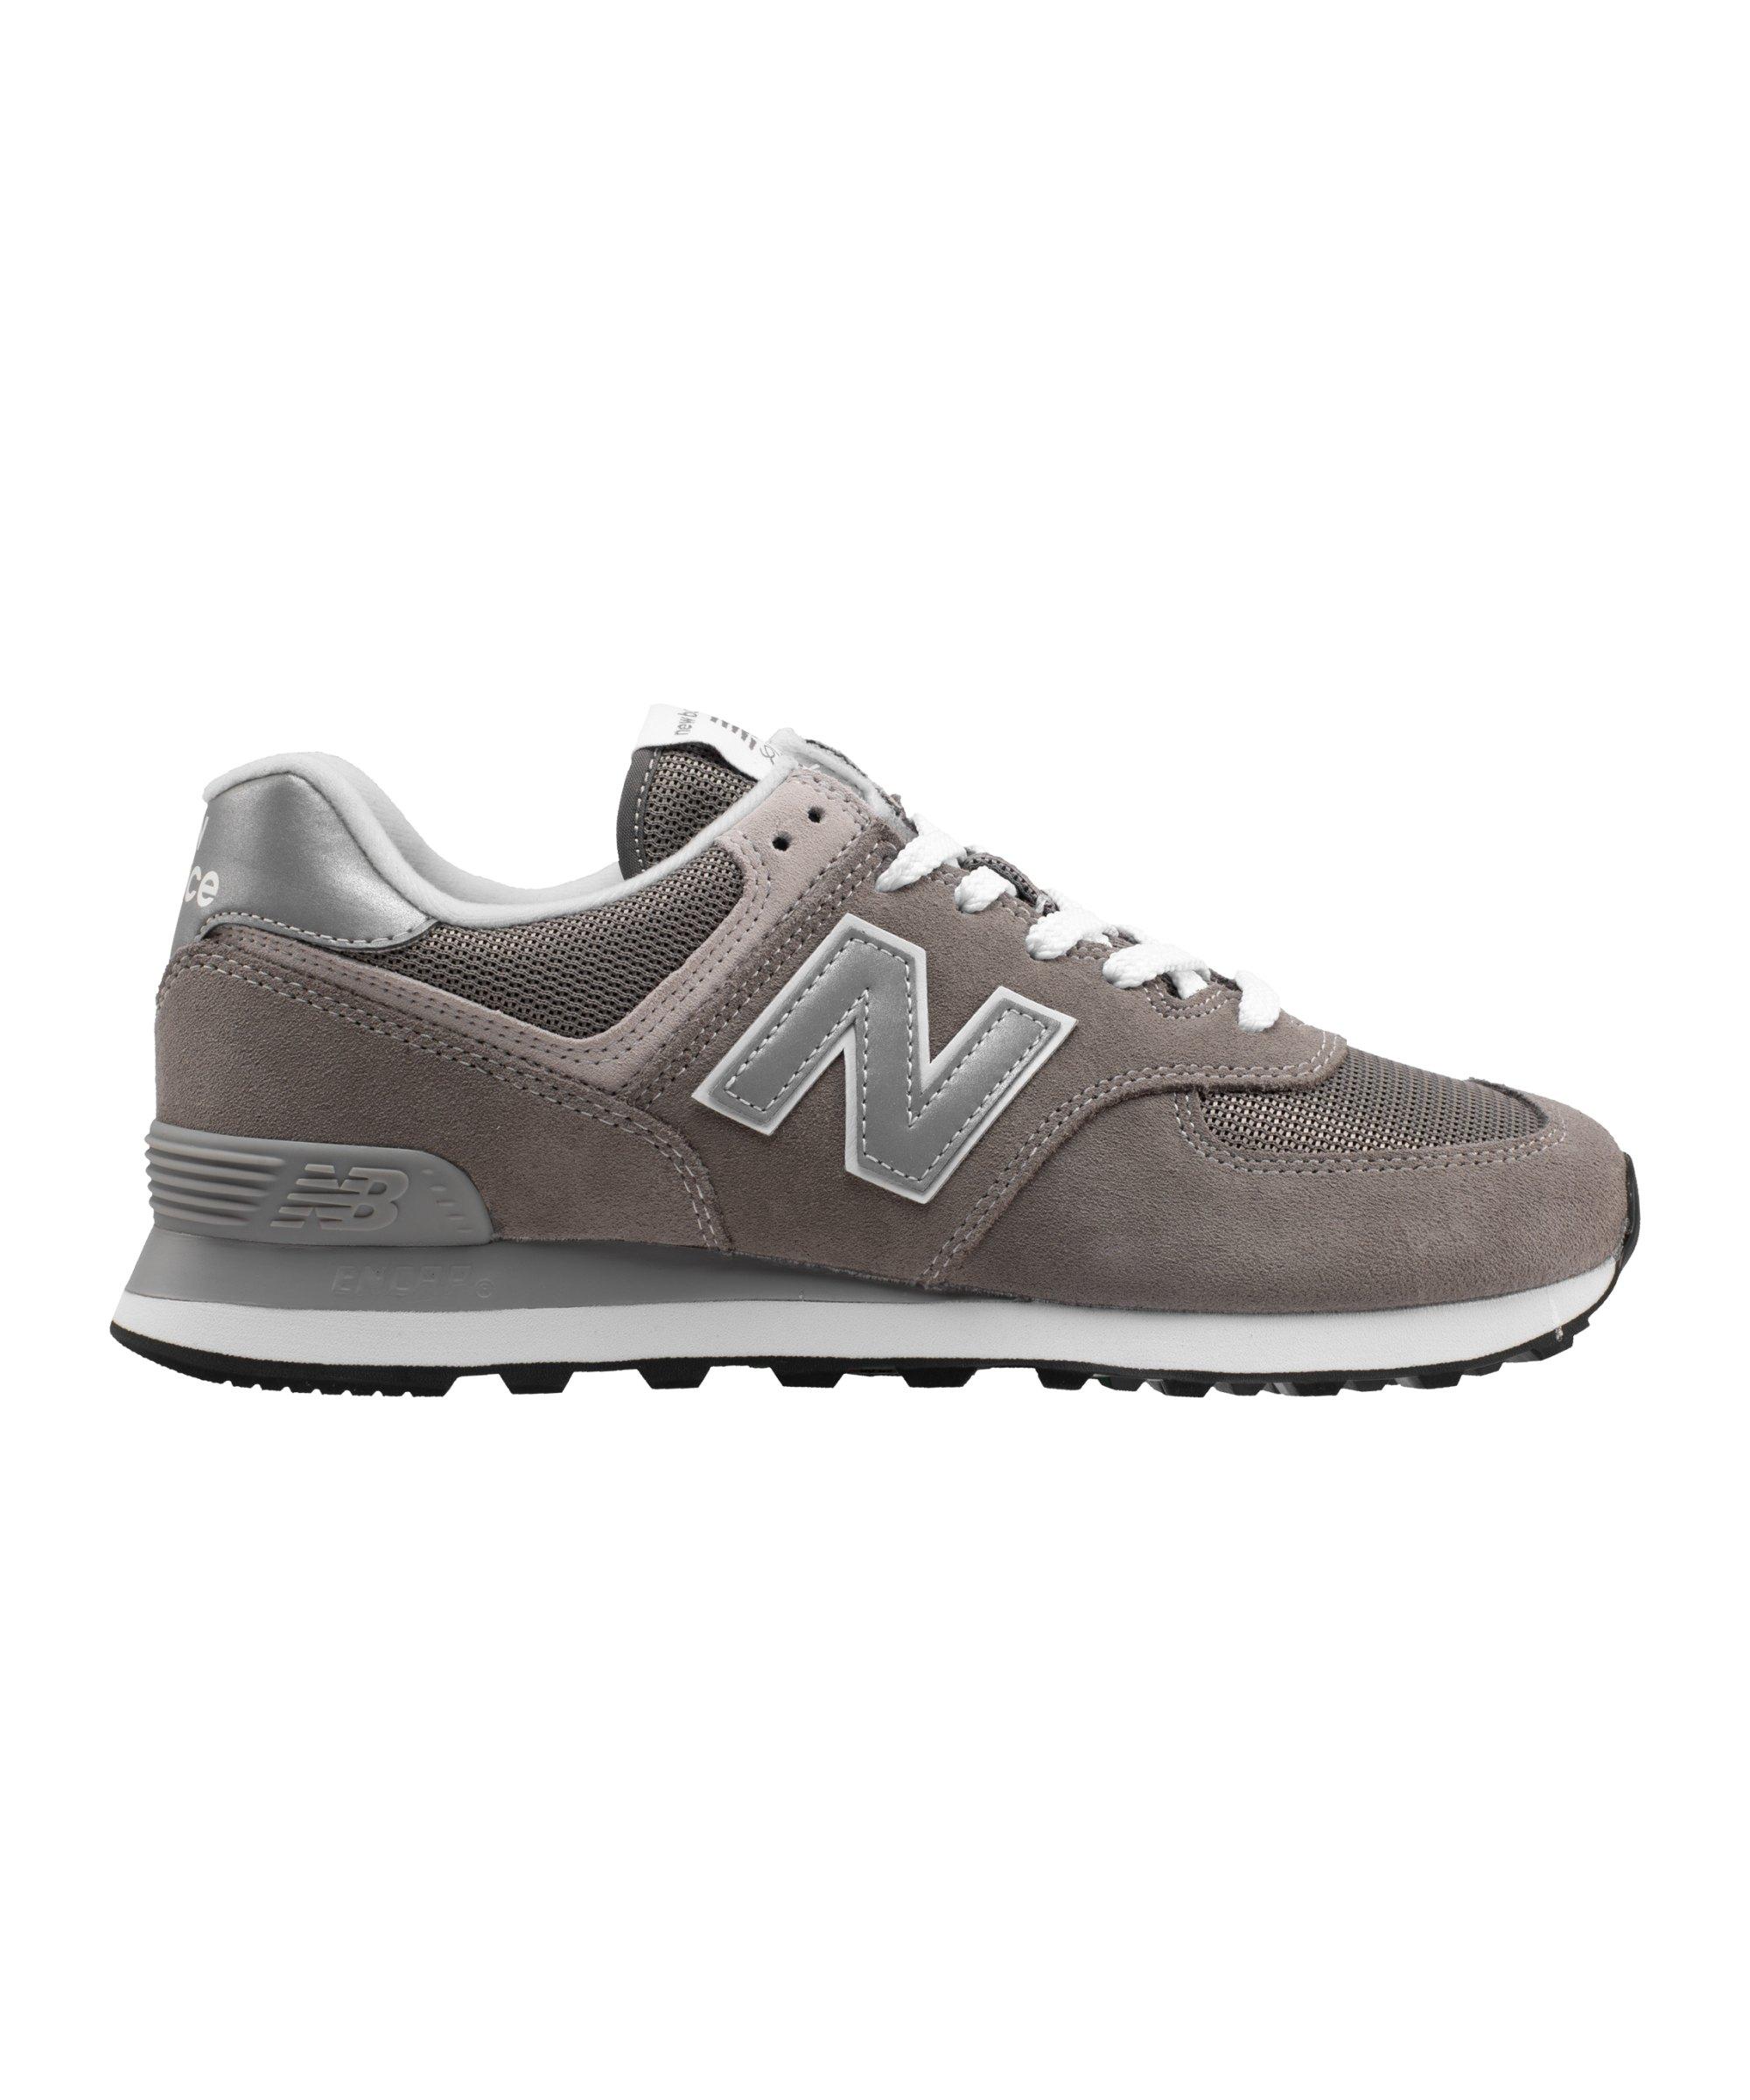 New Balance ML574 Sneaker Grau F121 - grau